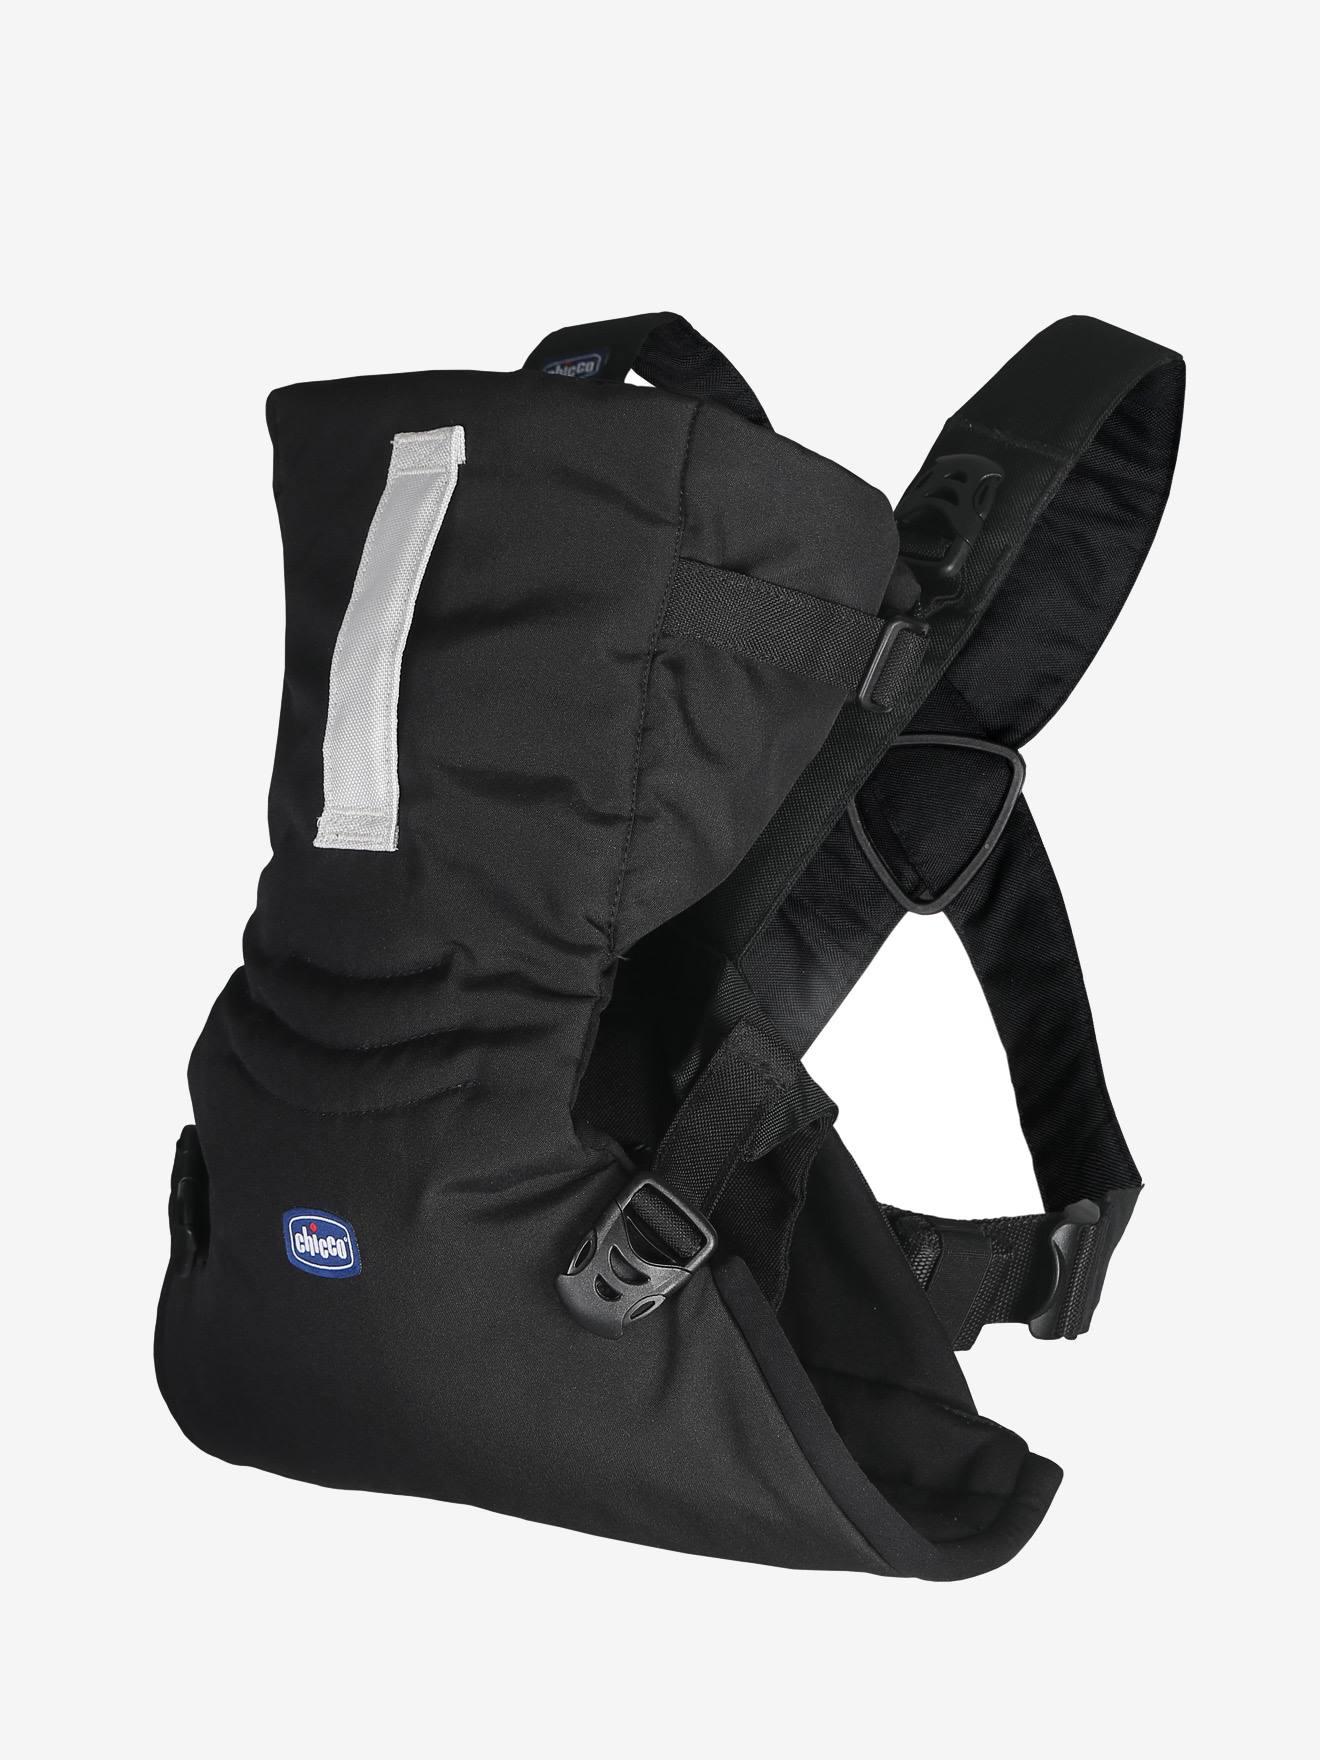 CHICCO Porta-bebé ergonómico CHICCO Easyfit negro